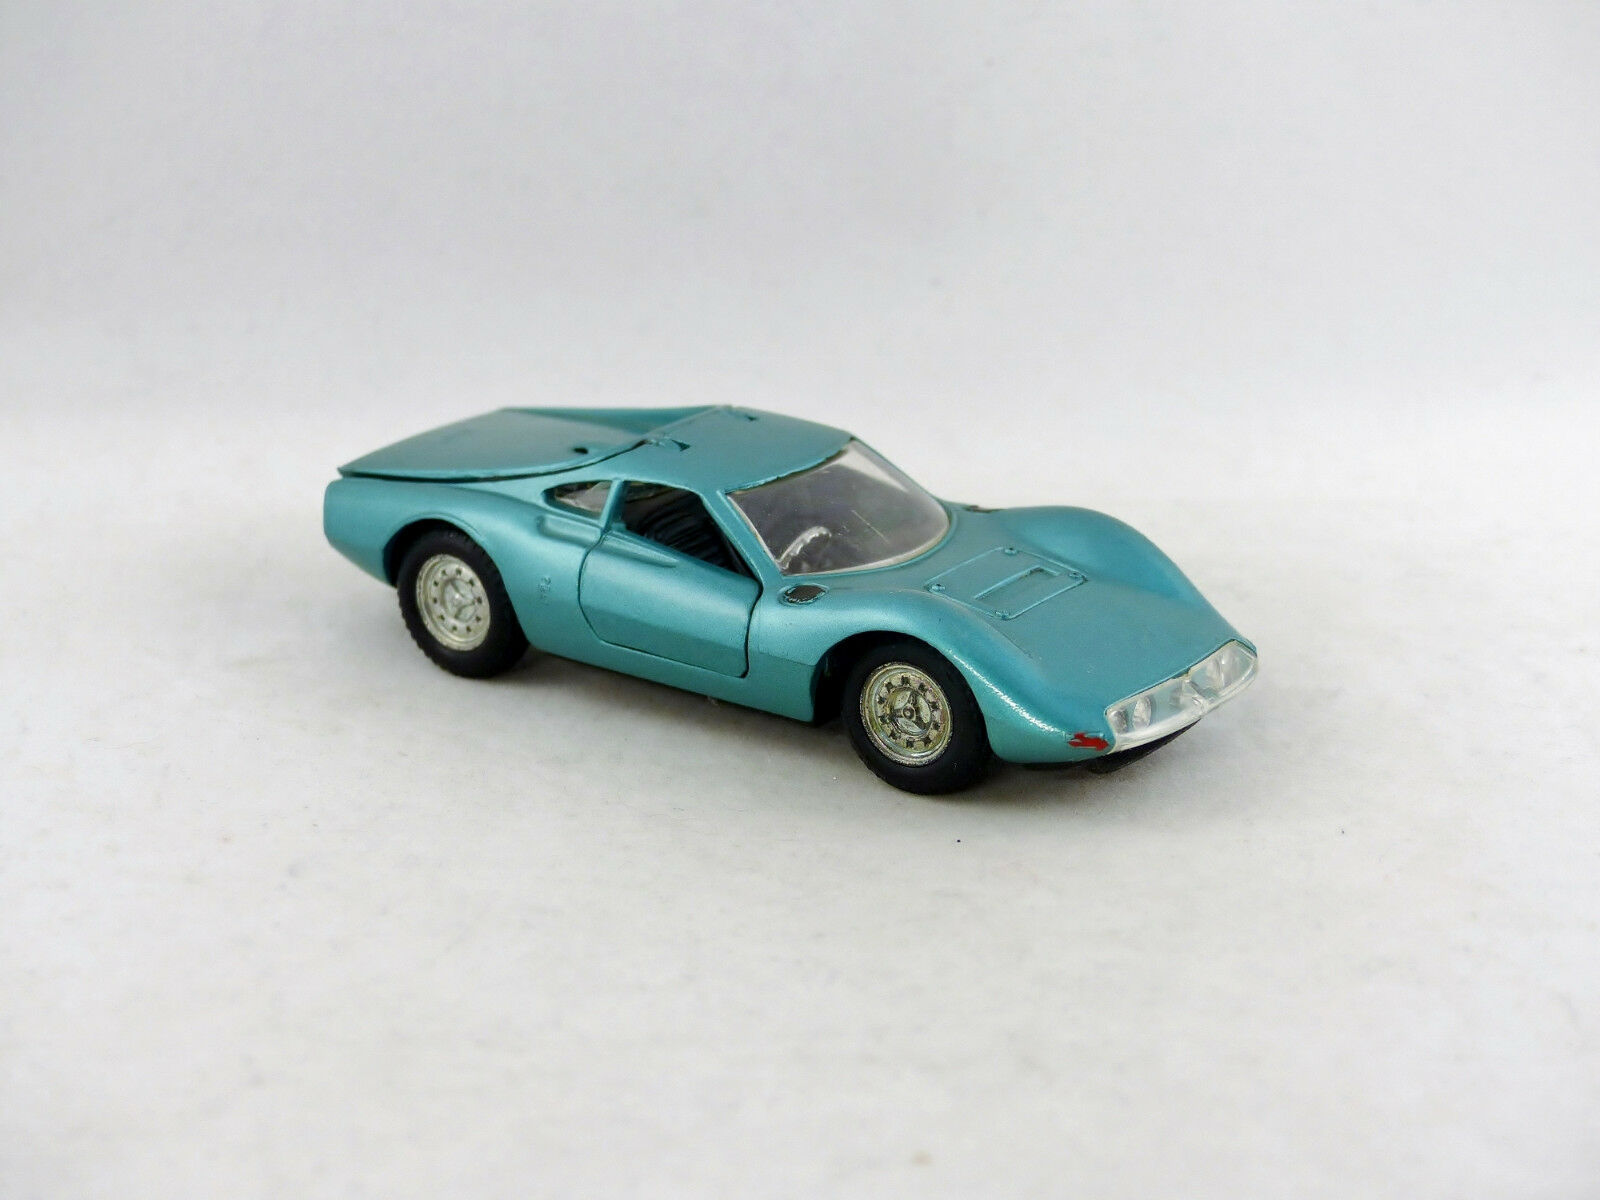 Politoys 536 M Dino Ferrari Pininfarina 1 43°  ( DKc)